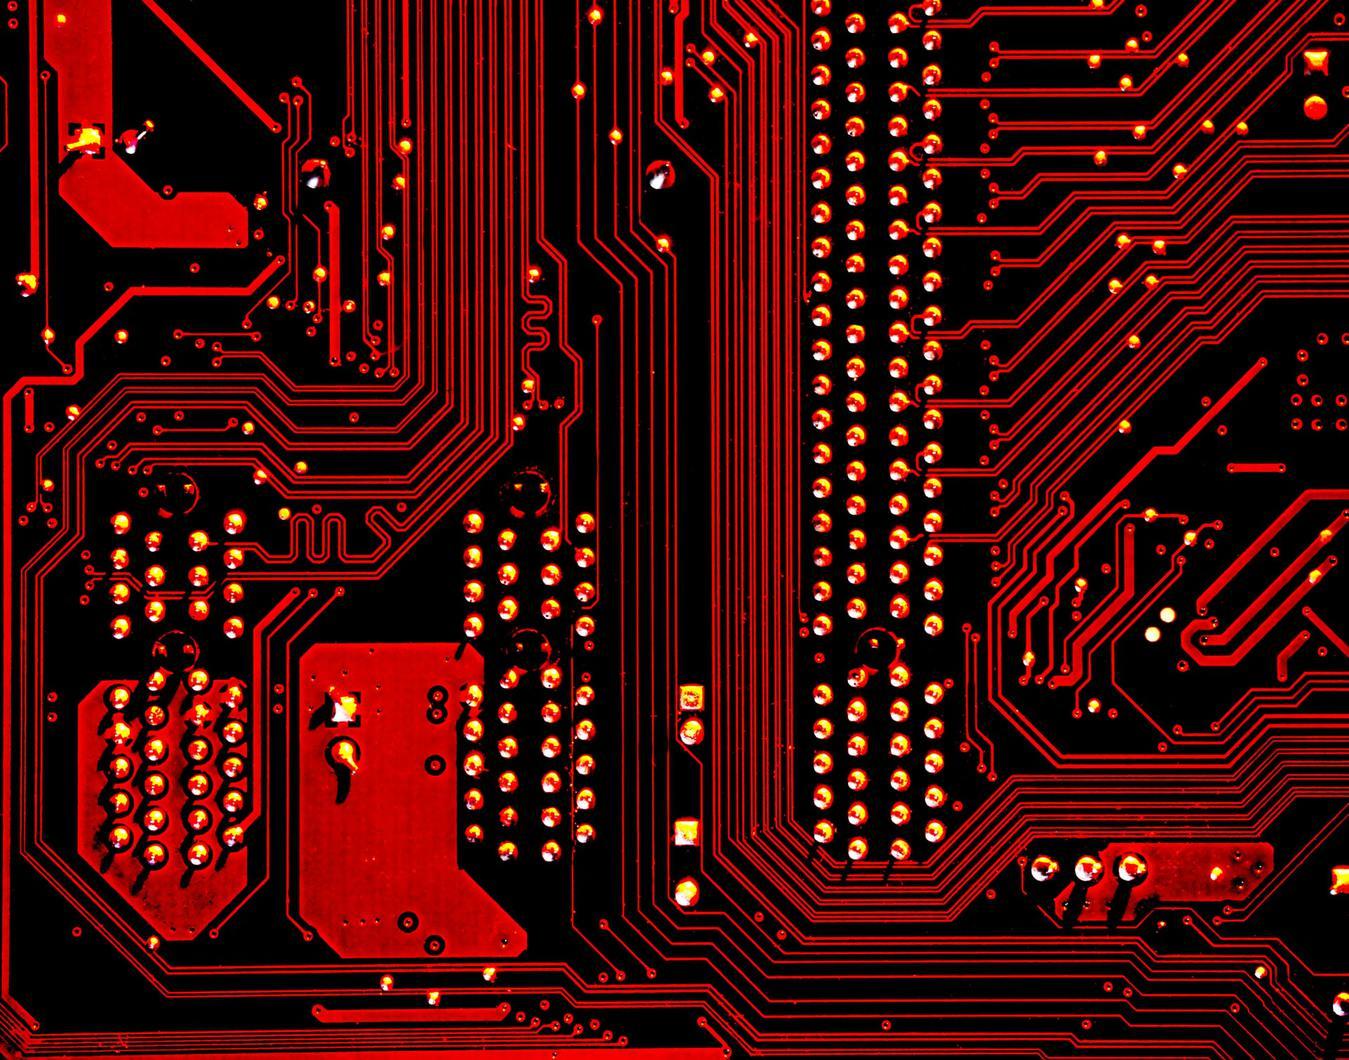 Gambar teknologi chip komputer berwarna merah dari dekat